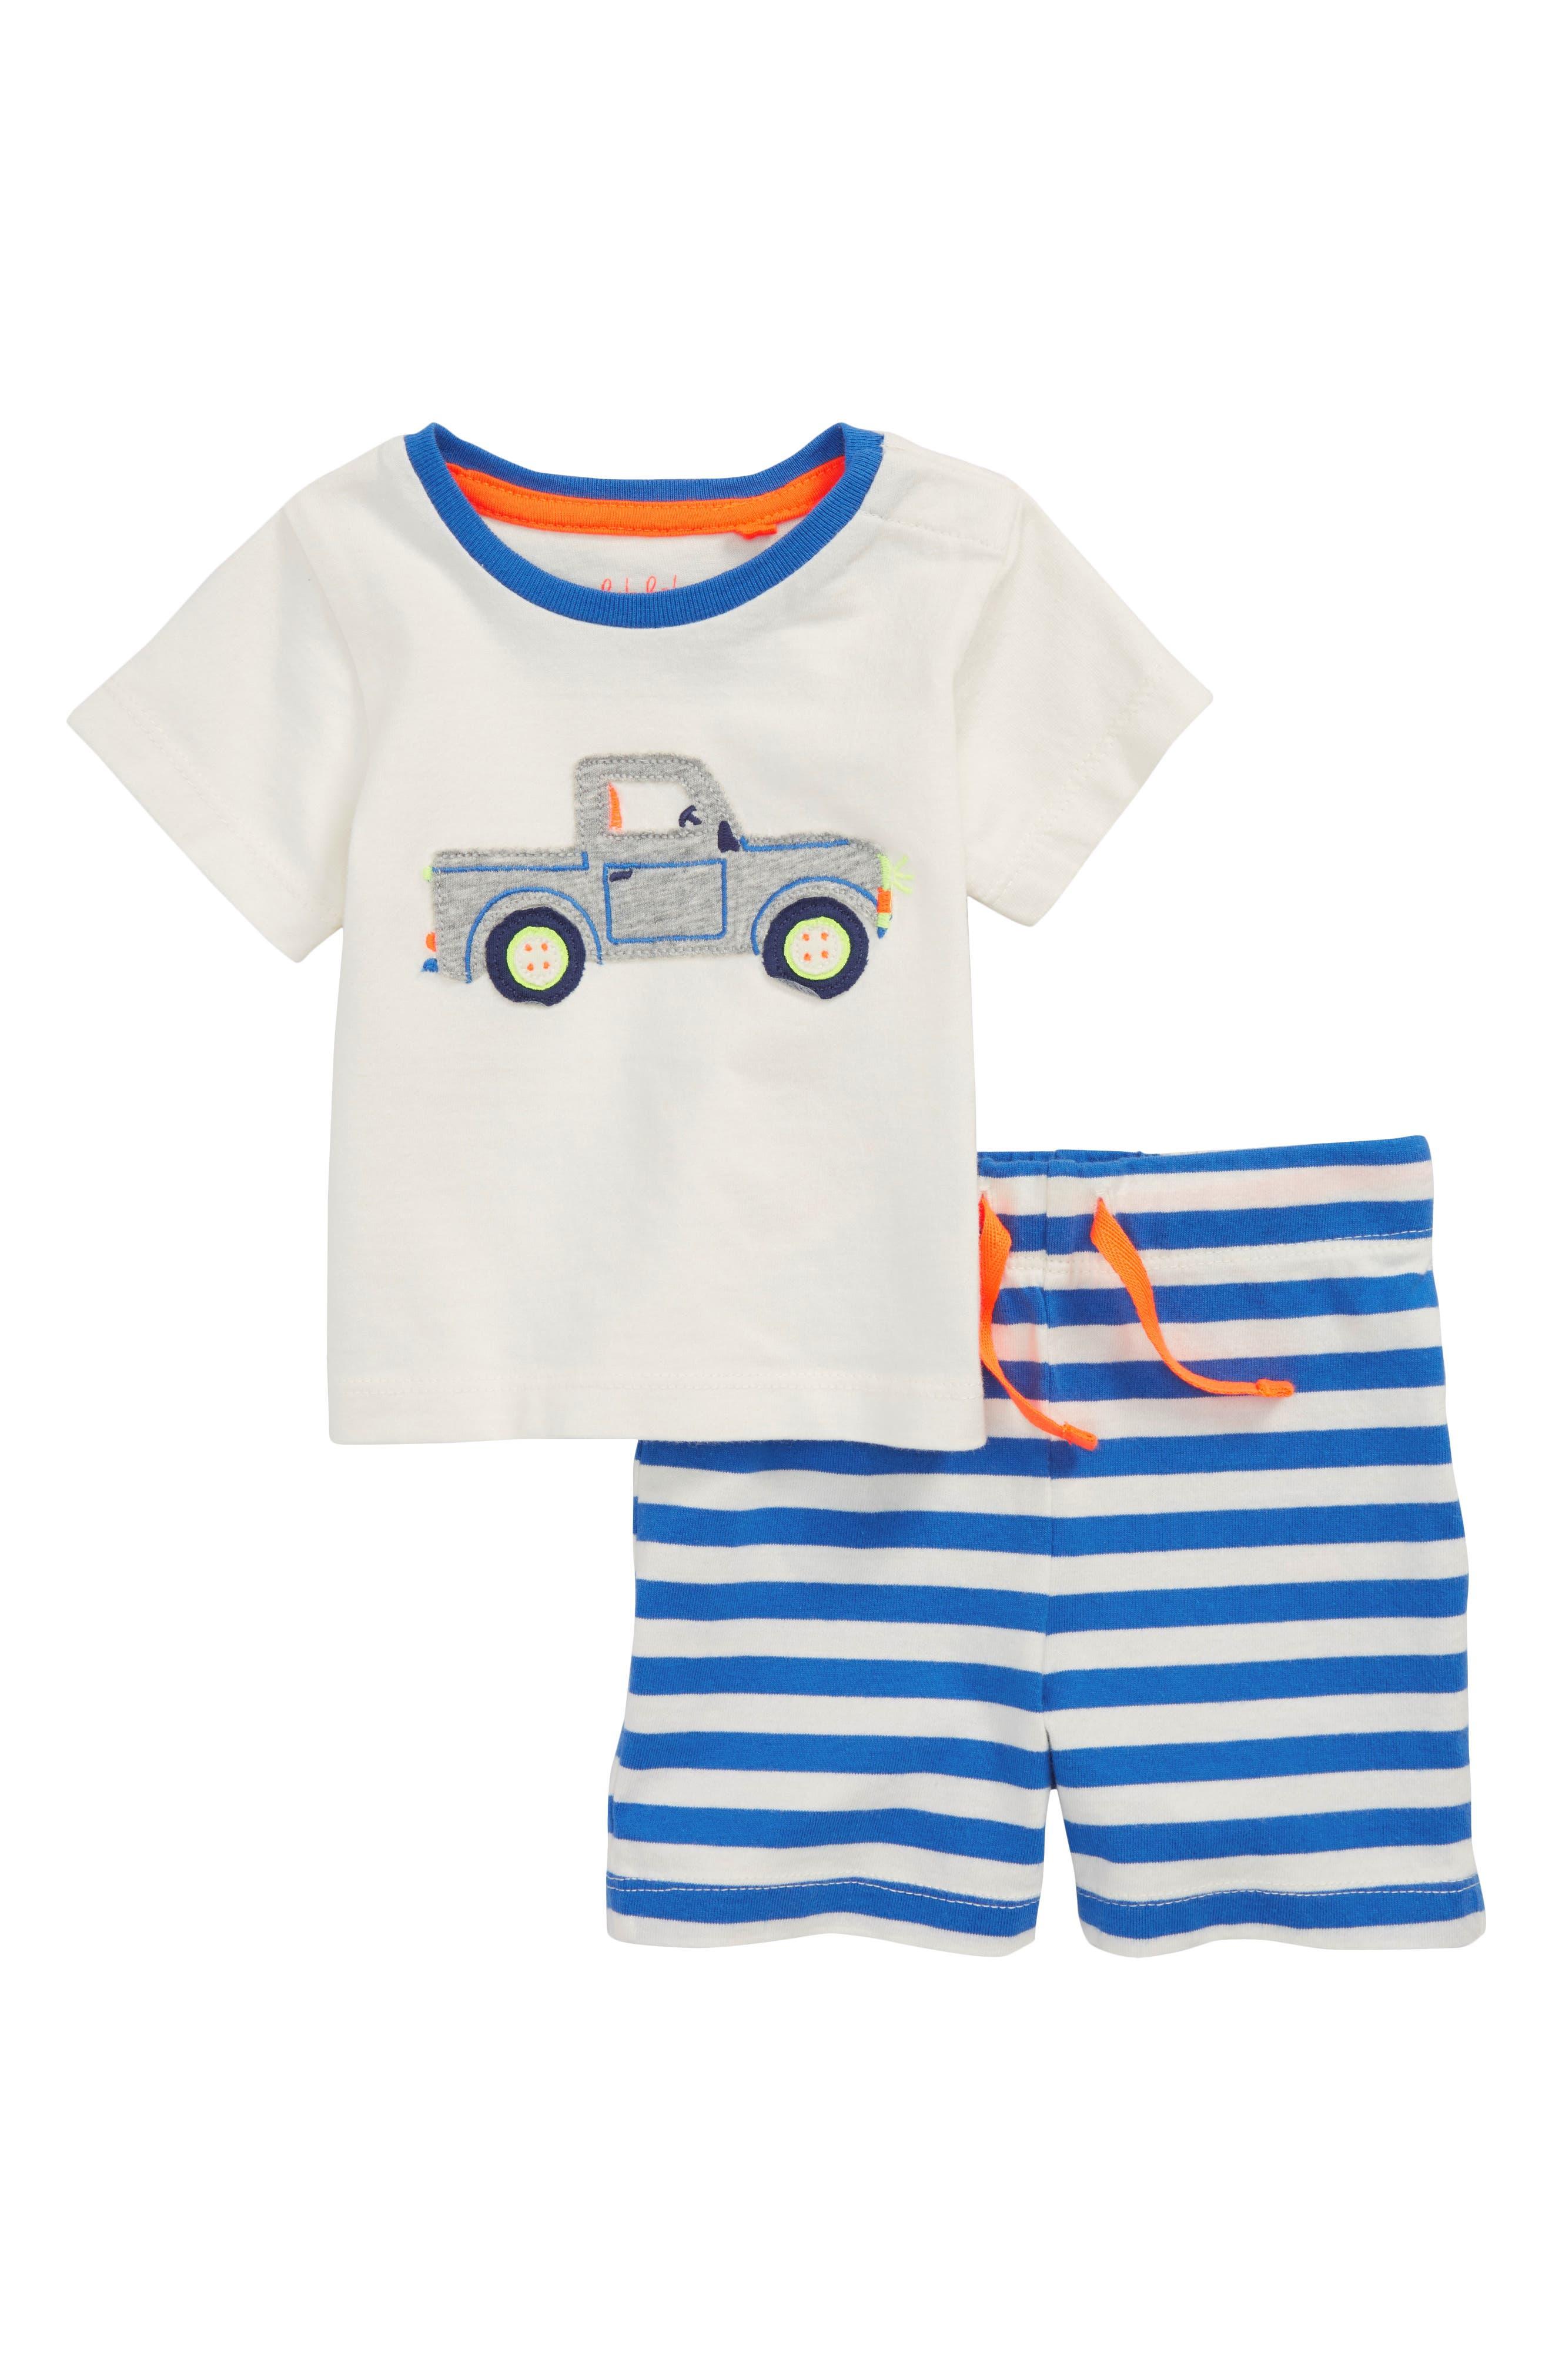 Fun Truck Appliqué T-Shirt & Shorts Set,                             Main thumbnail 1, color,